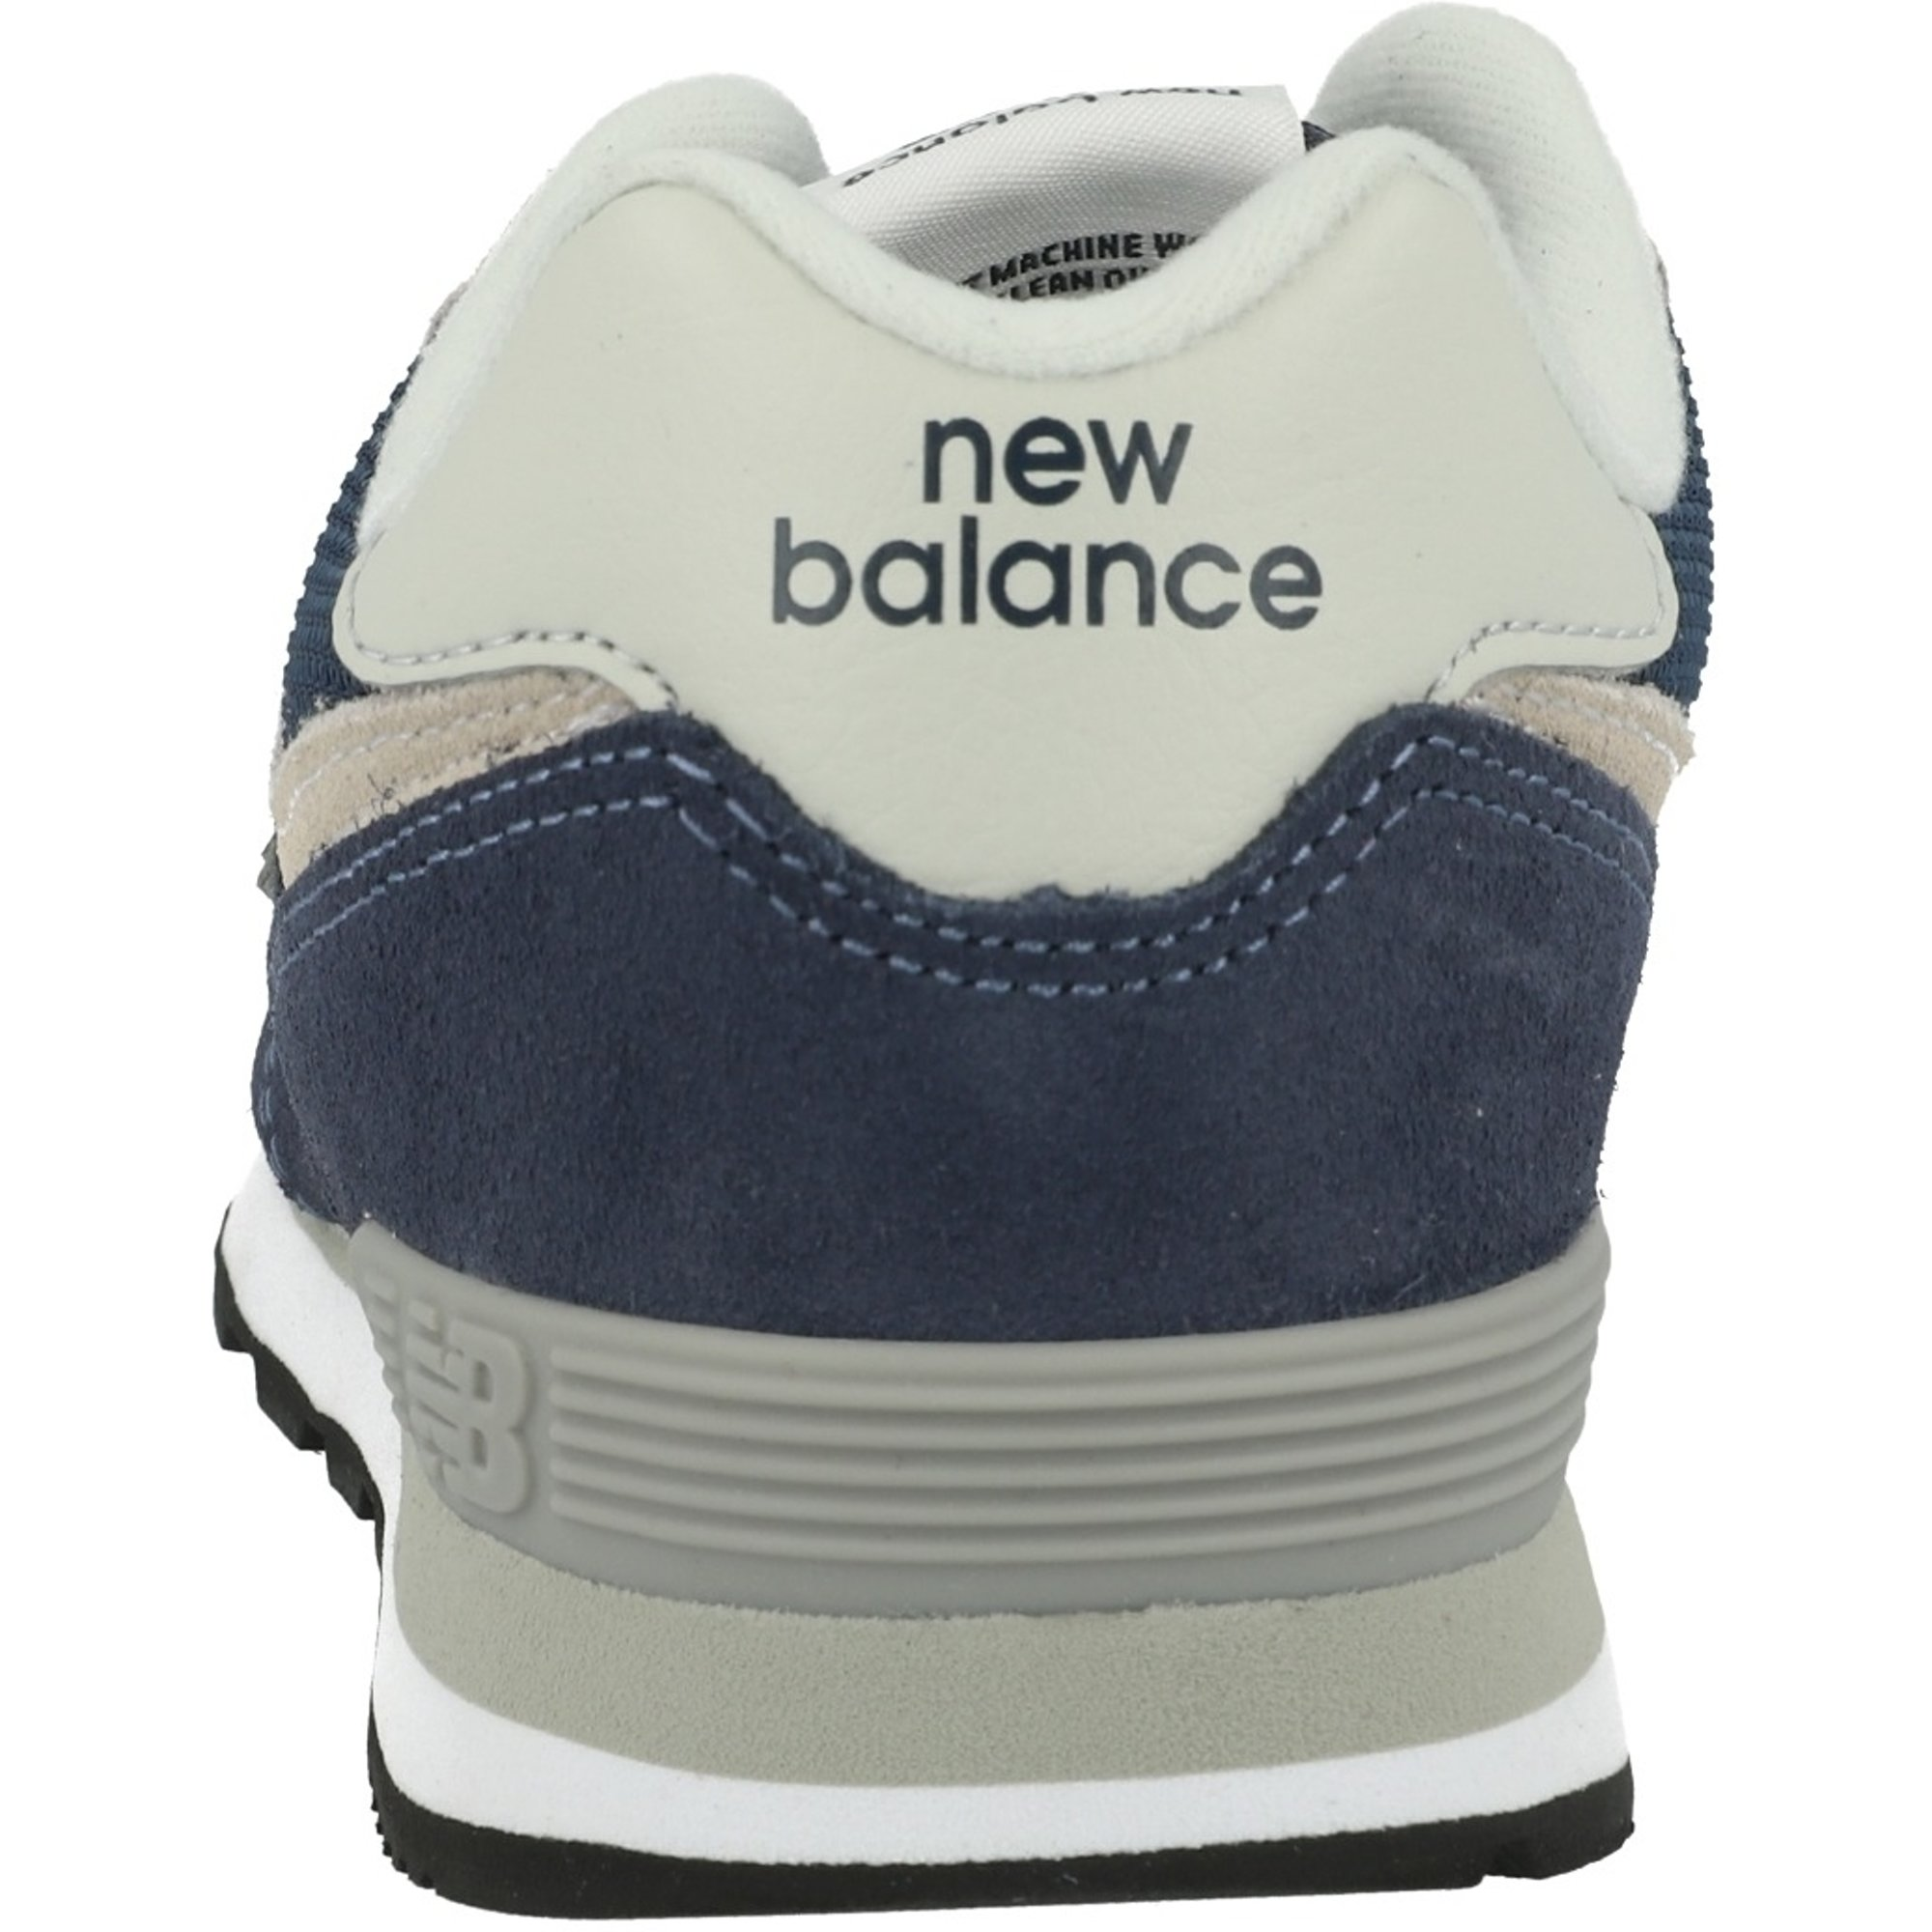 New Balance 574 Navy/Gray Suede Junior